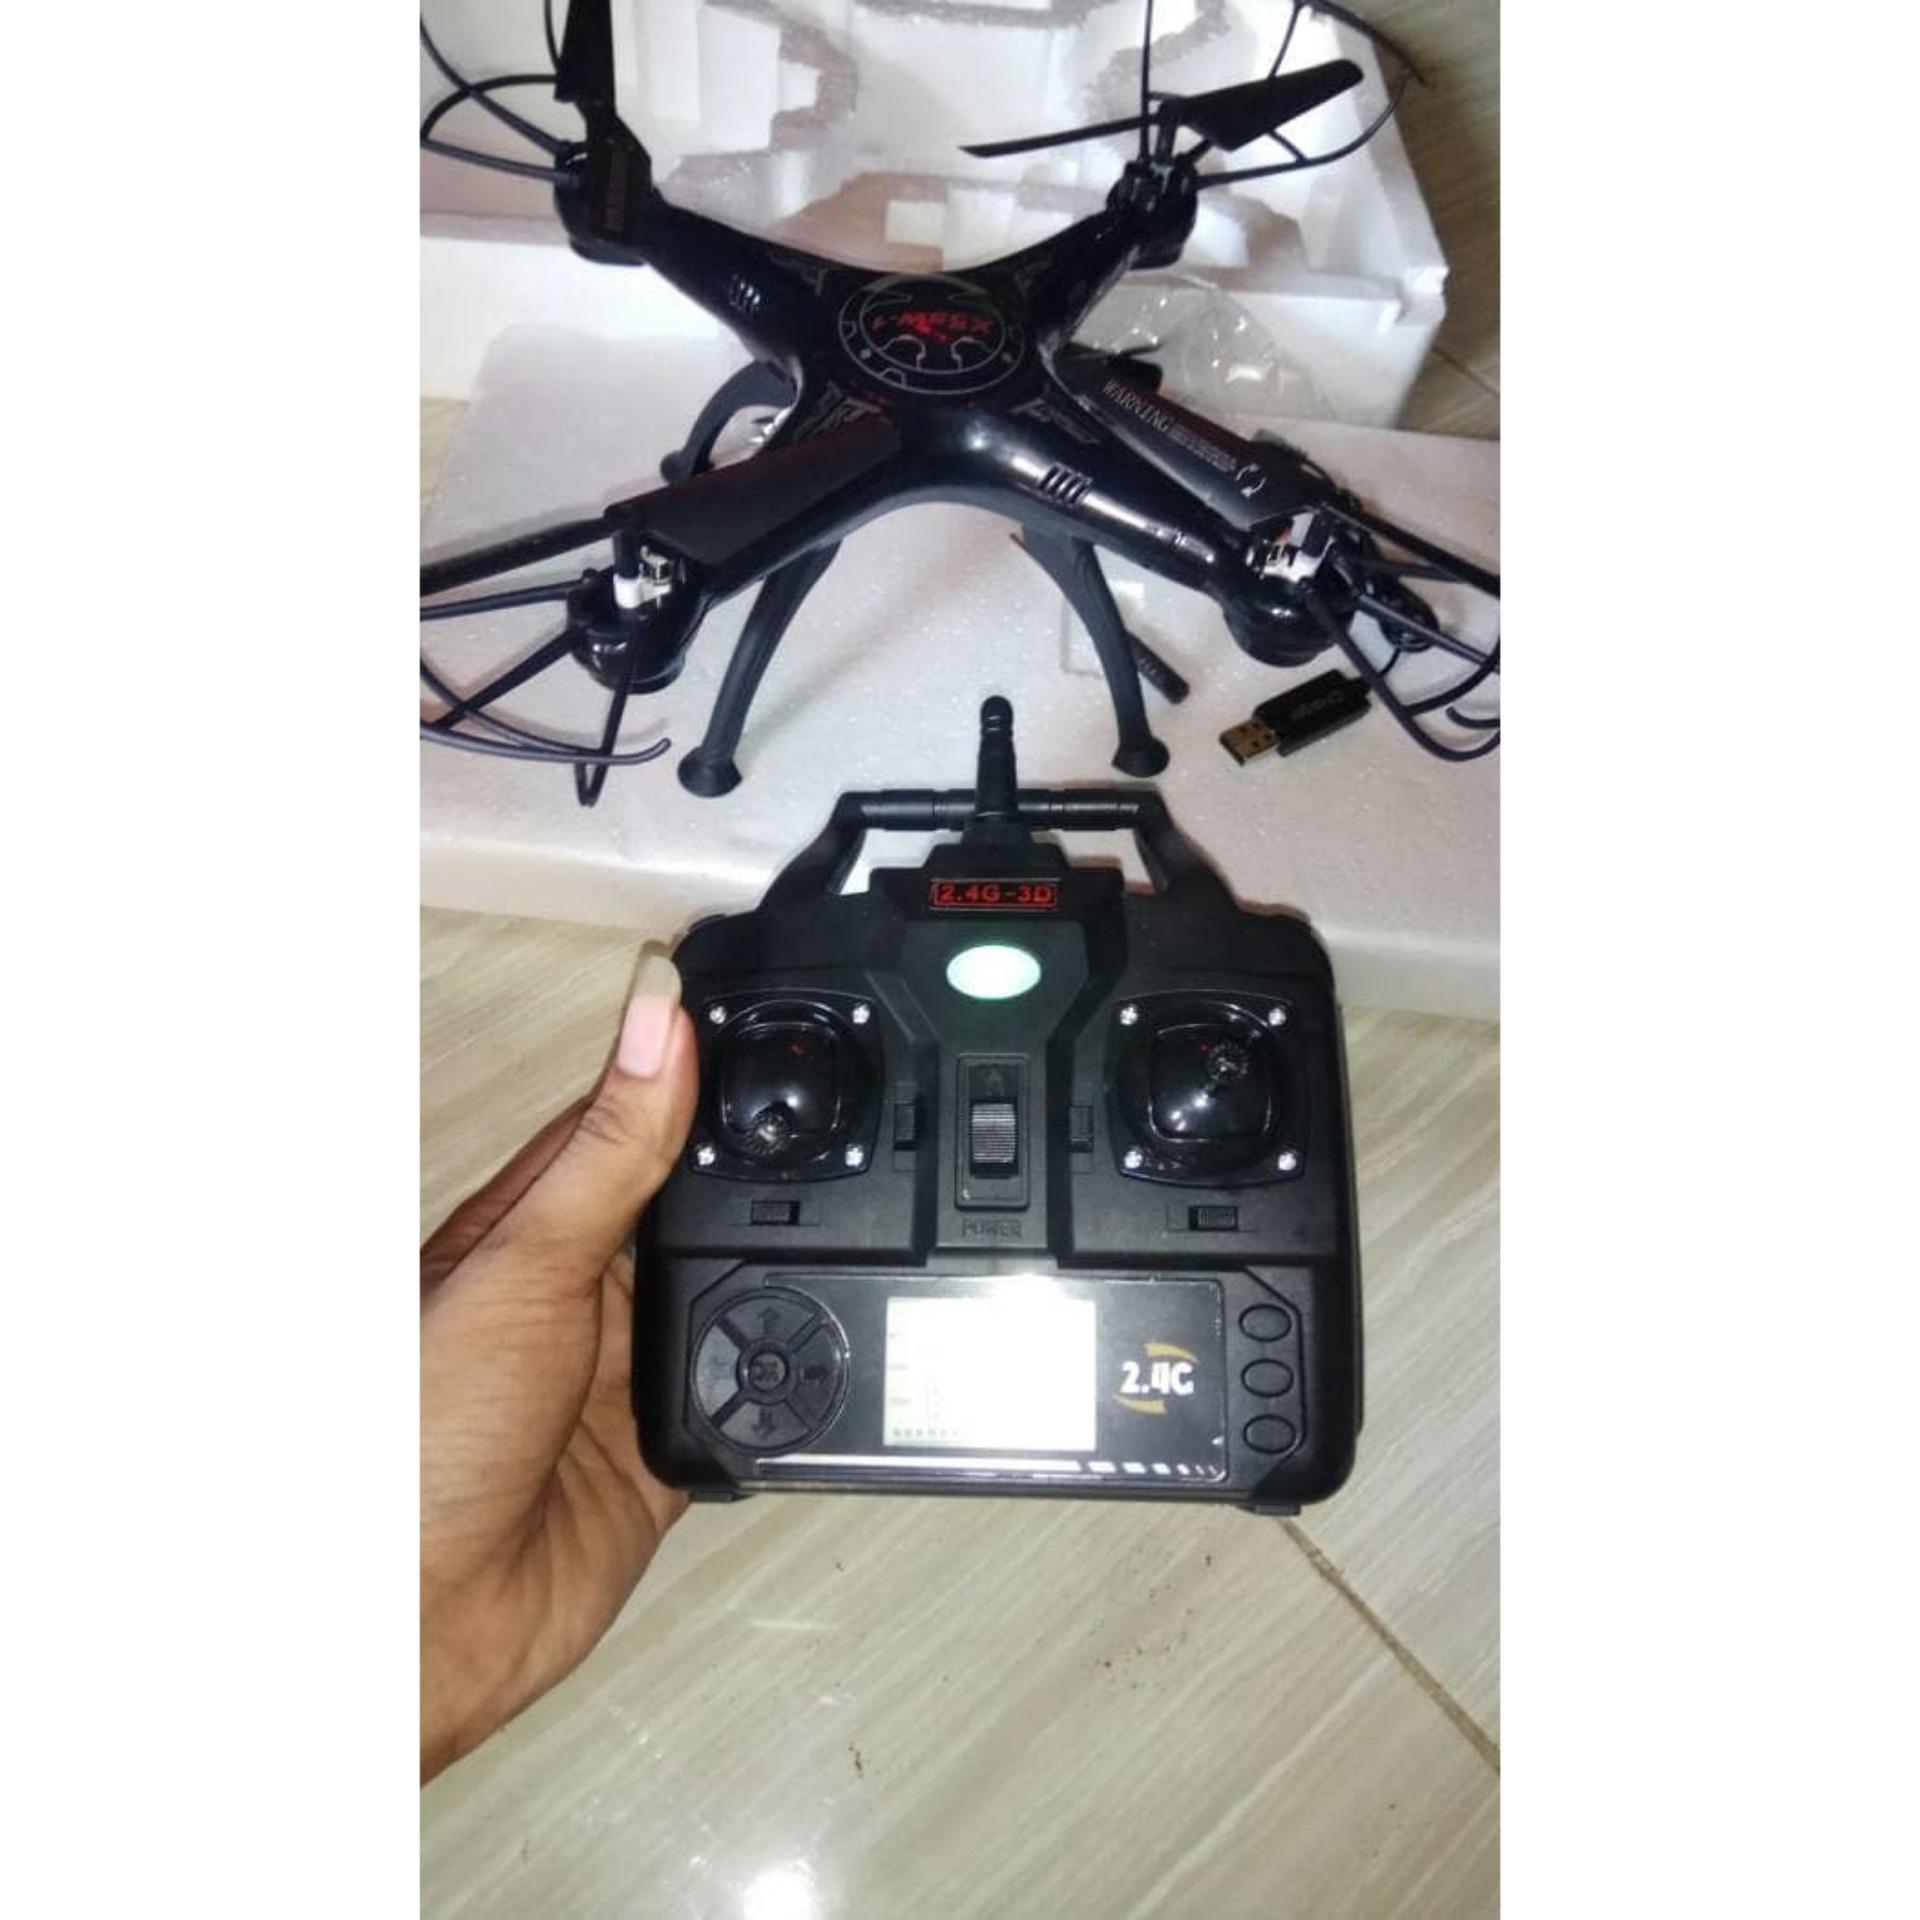 x5sw-1 syma drone pesawat terbang termurah